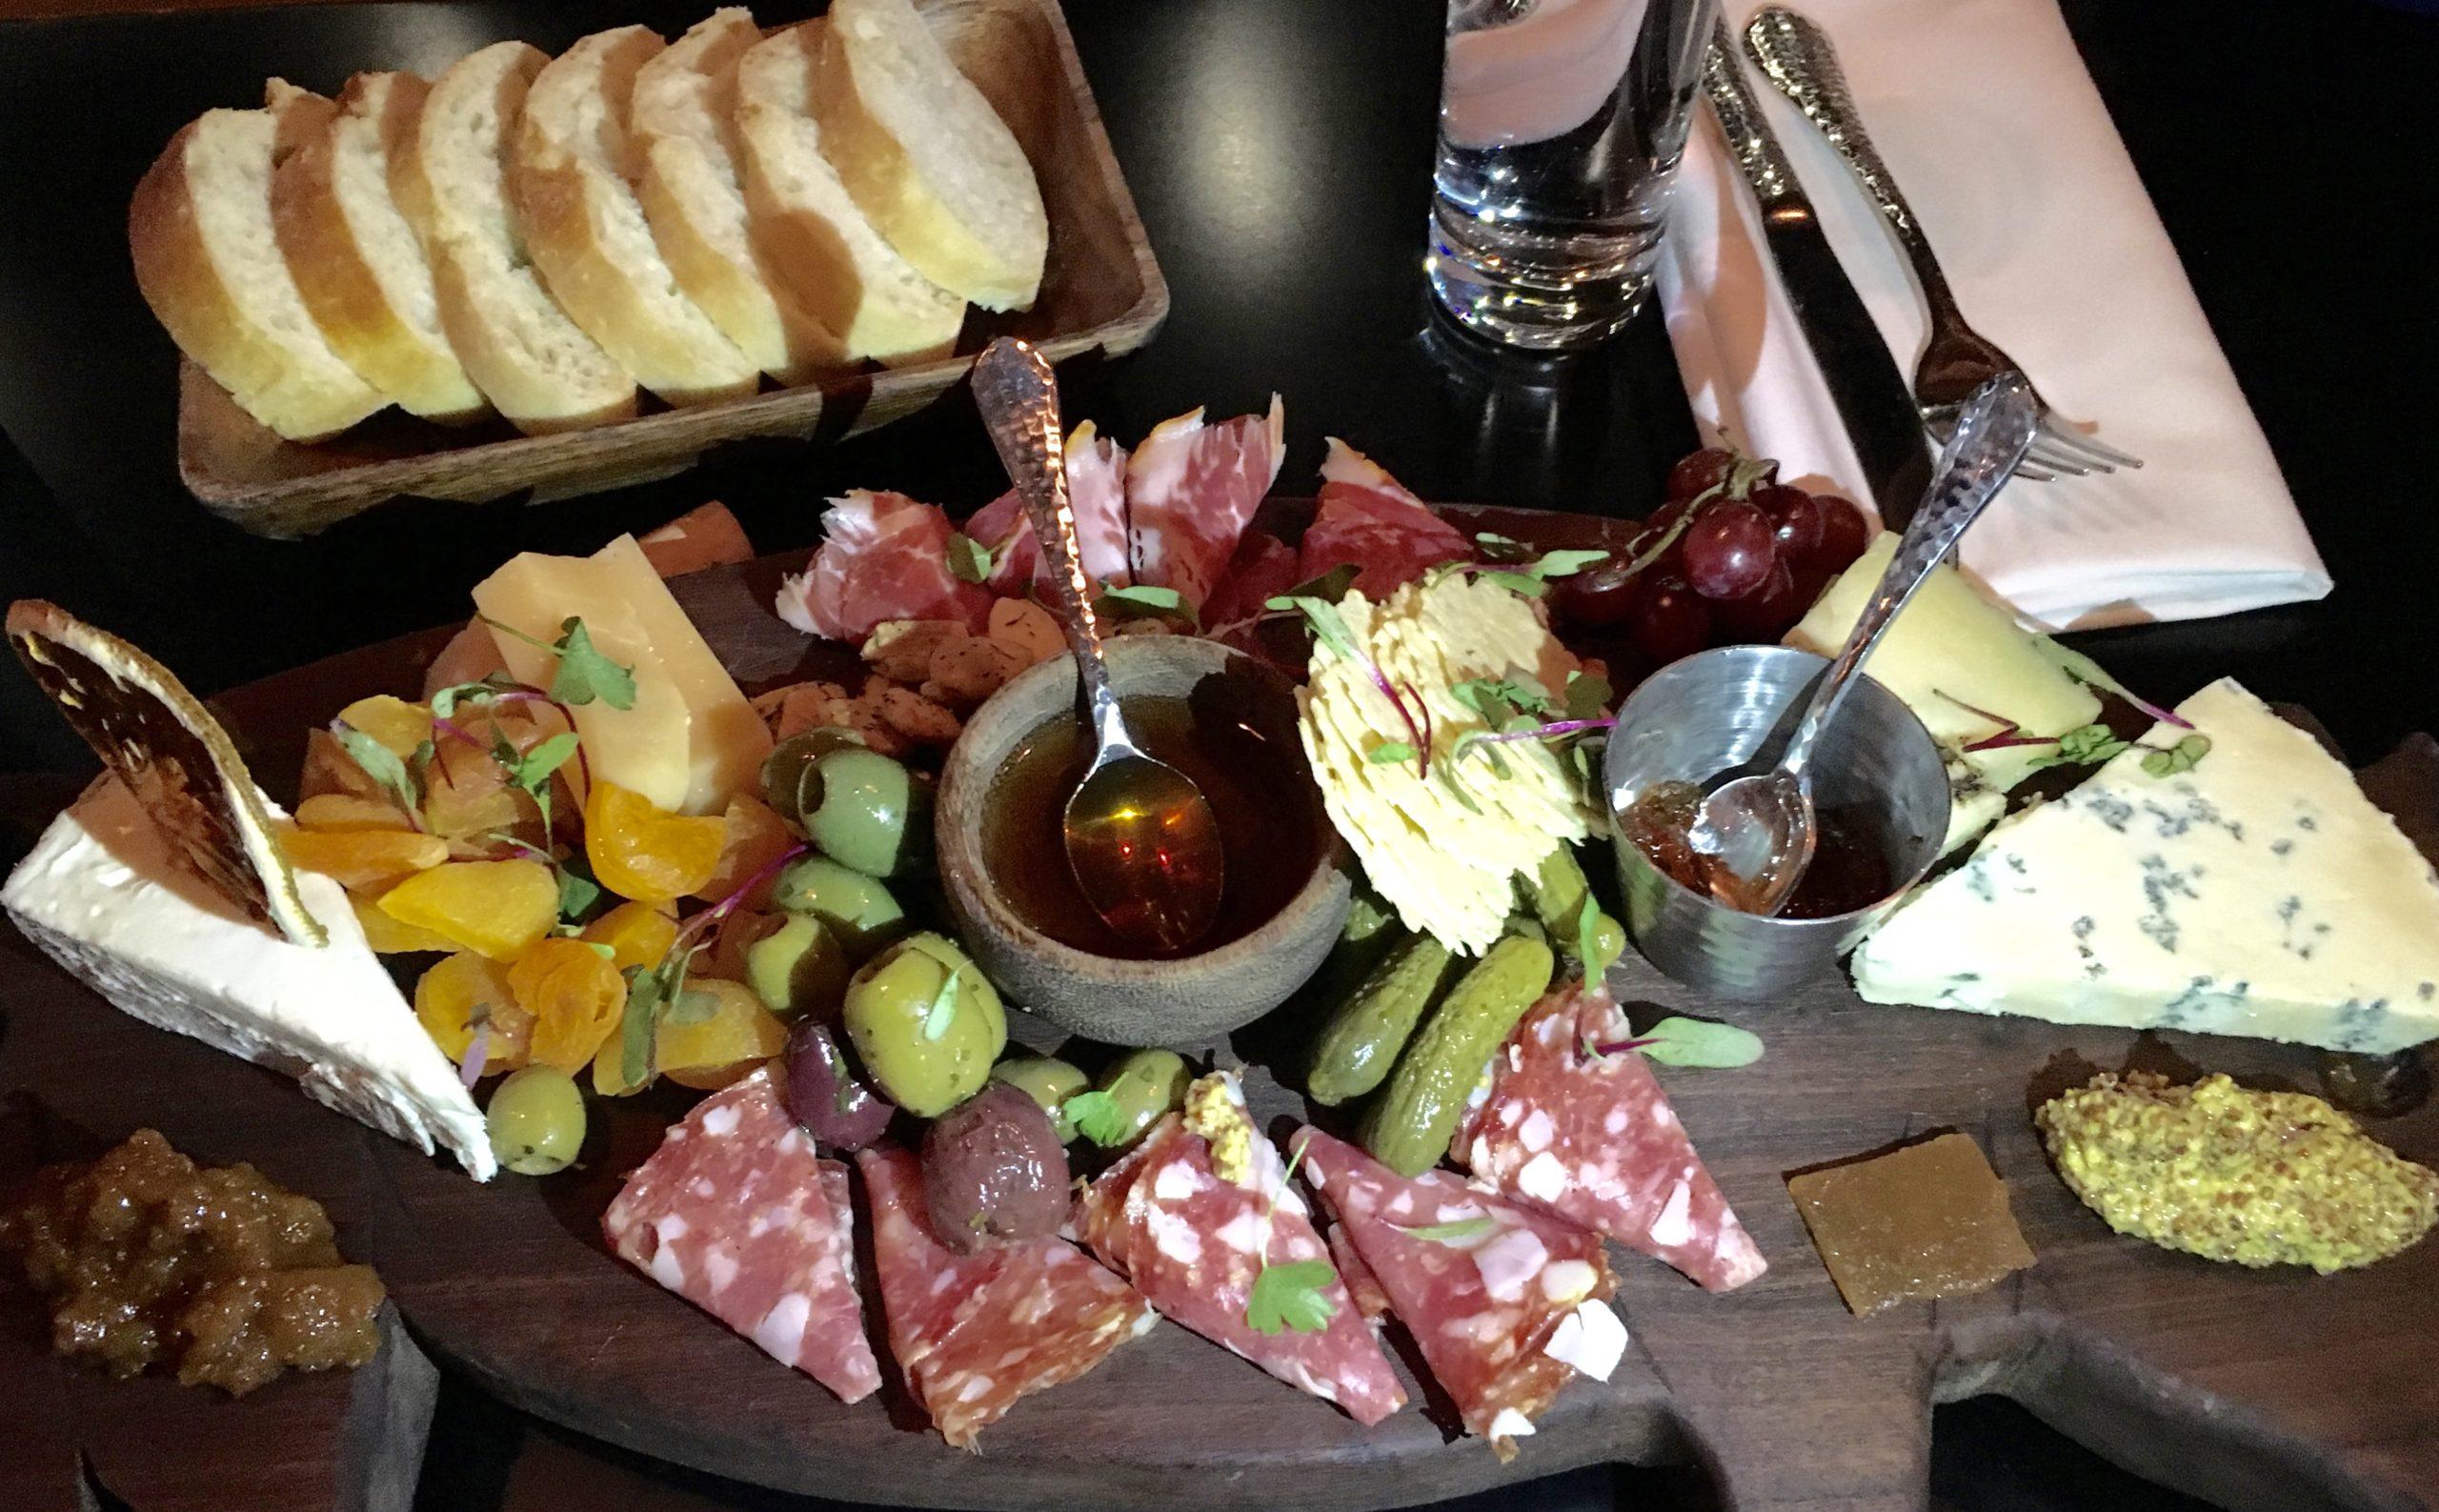 Annata Wine's Cheese & Charcuterie Platter